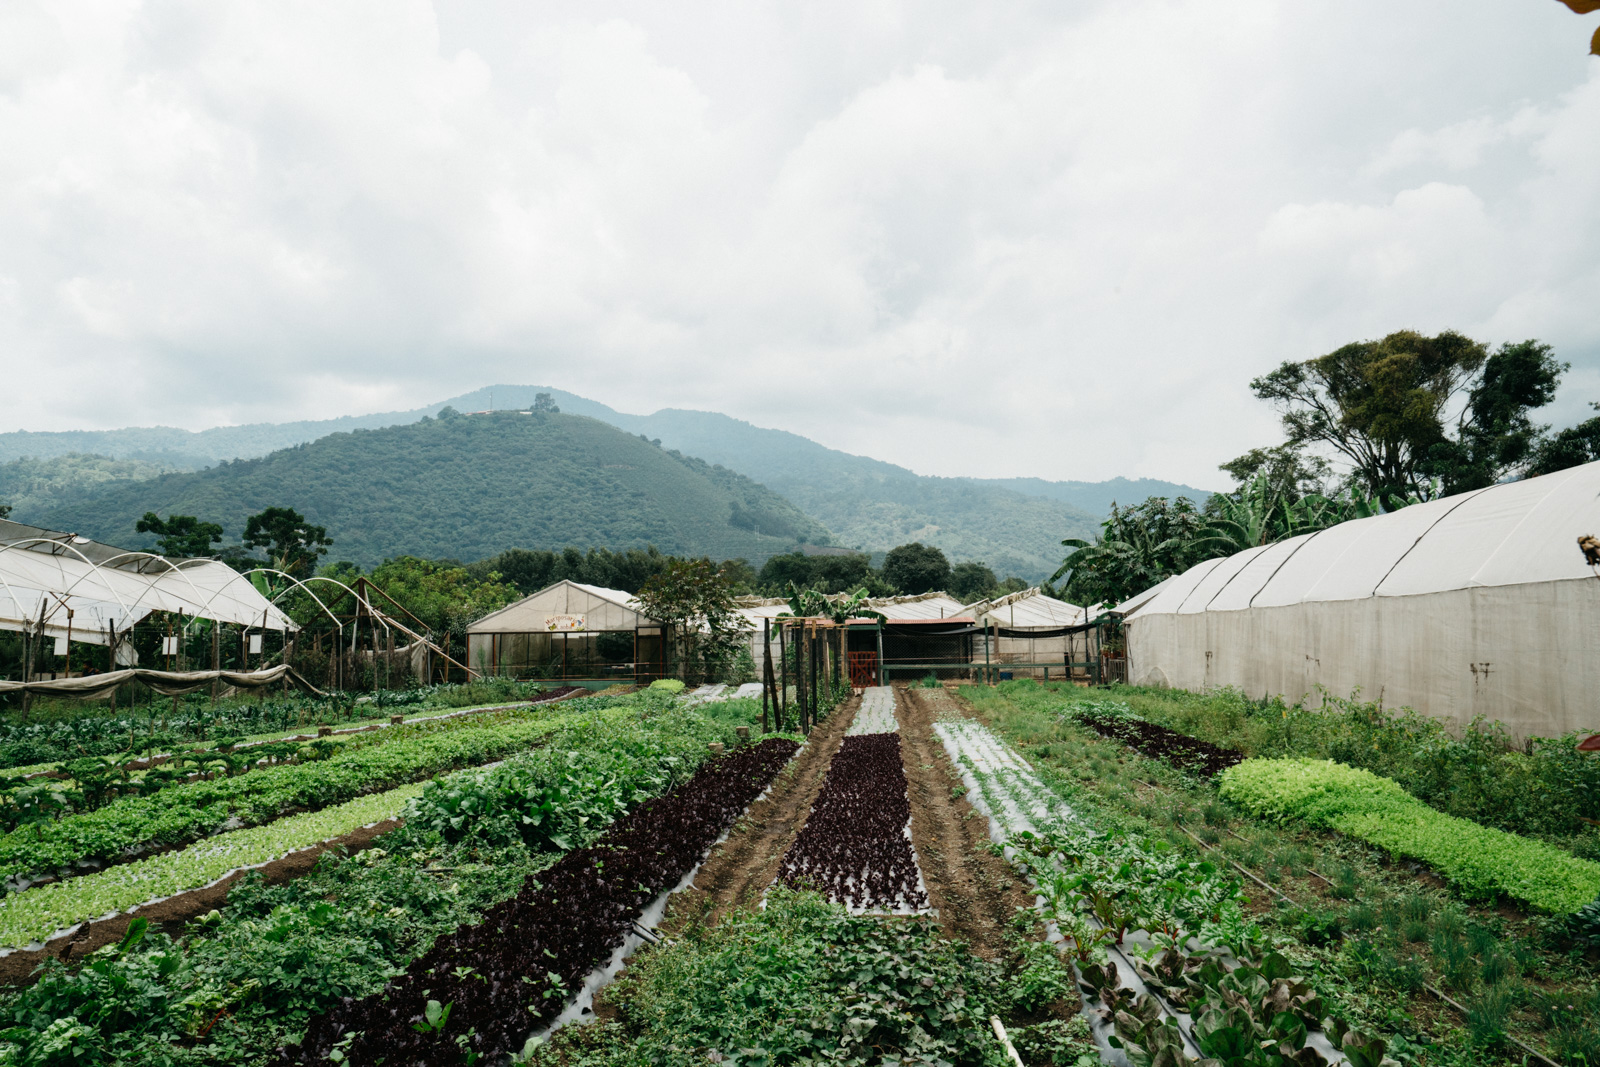 guatemala-38.jpg